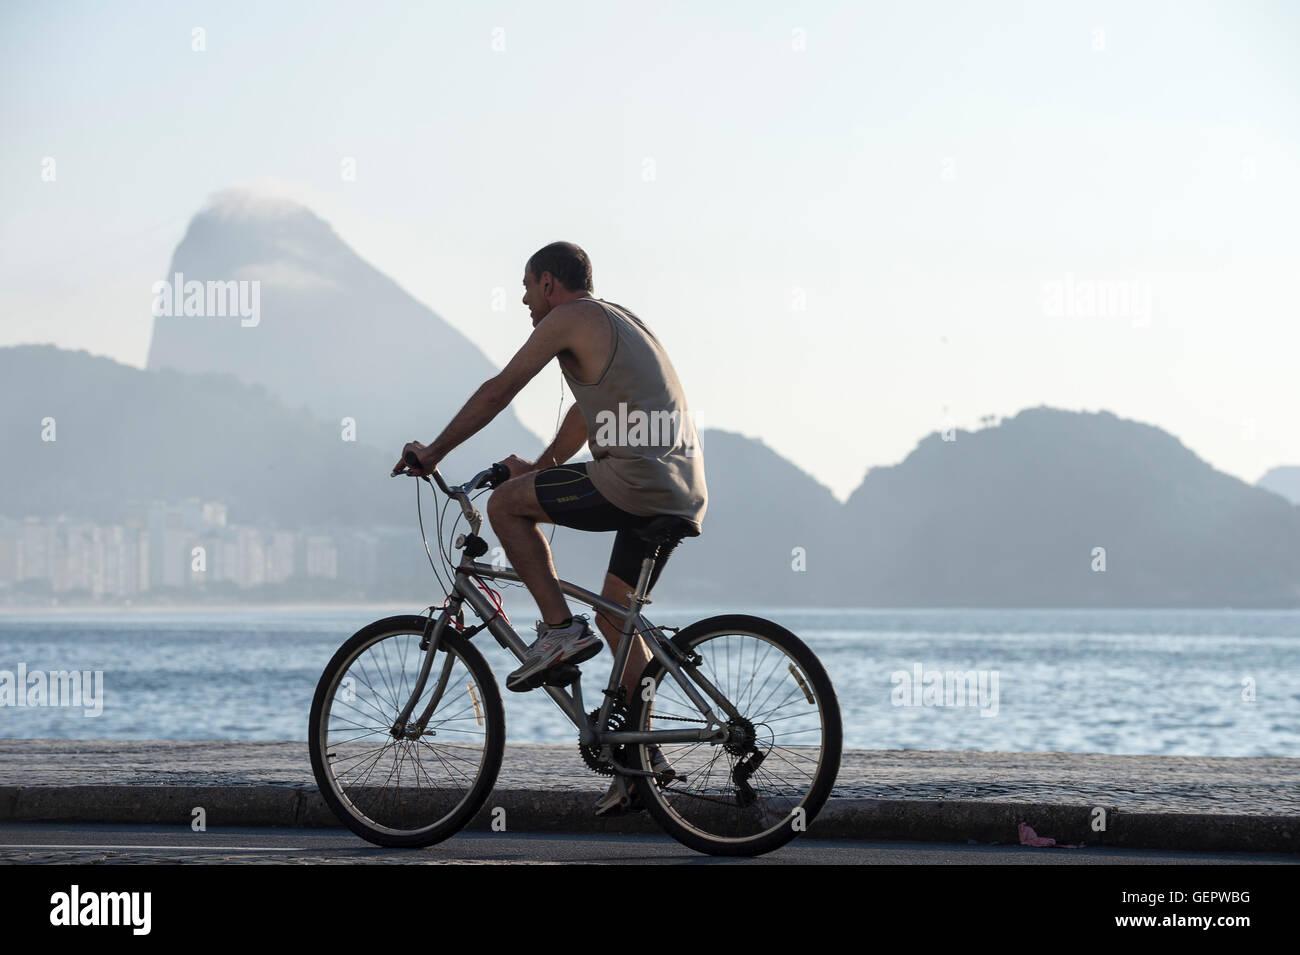 RIO DE JANEIRO - APRIL 3, 2016: Young Brazilian man rides a bicycle on the beachfront boardwalk at Copacabana Beach. - Stock Image